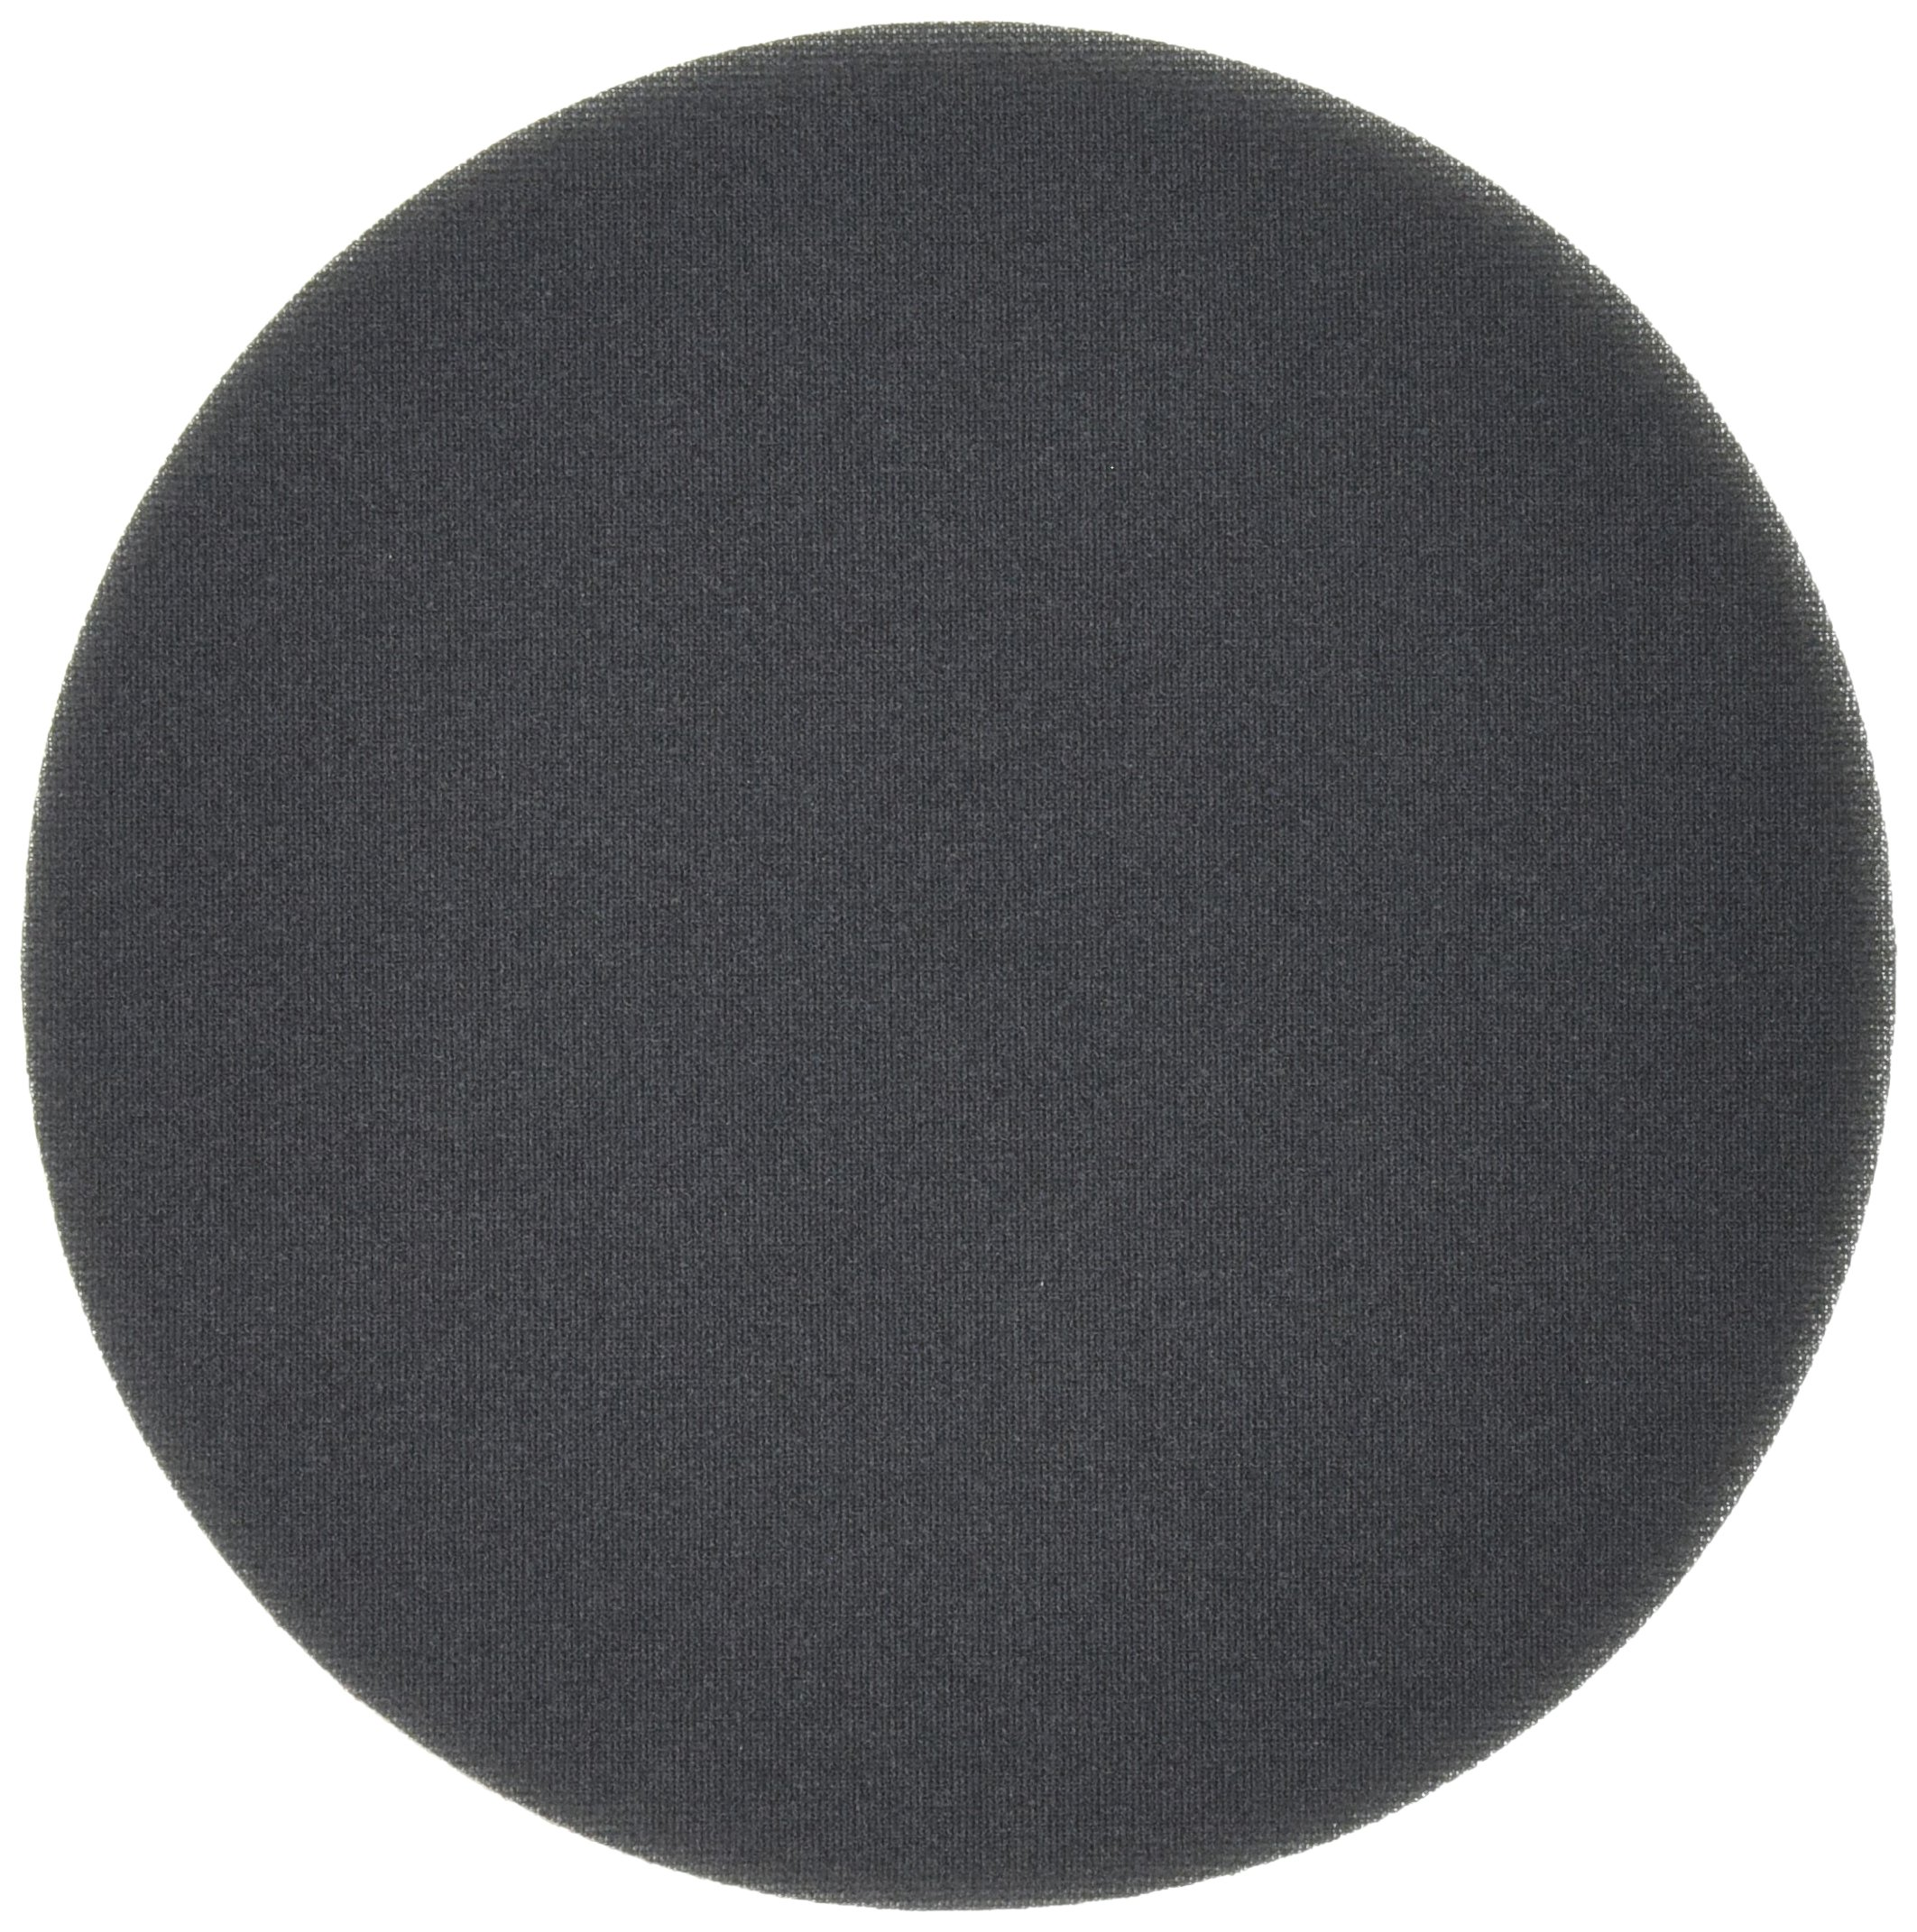 Mirka Abralon 6 Inch Foam Grip Disc 360G - Box of 20 by Mirka